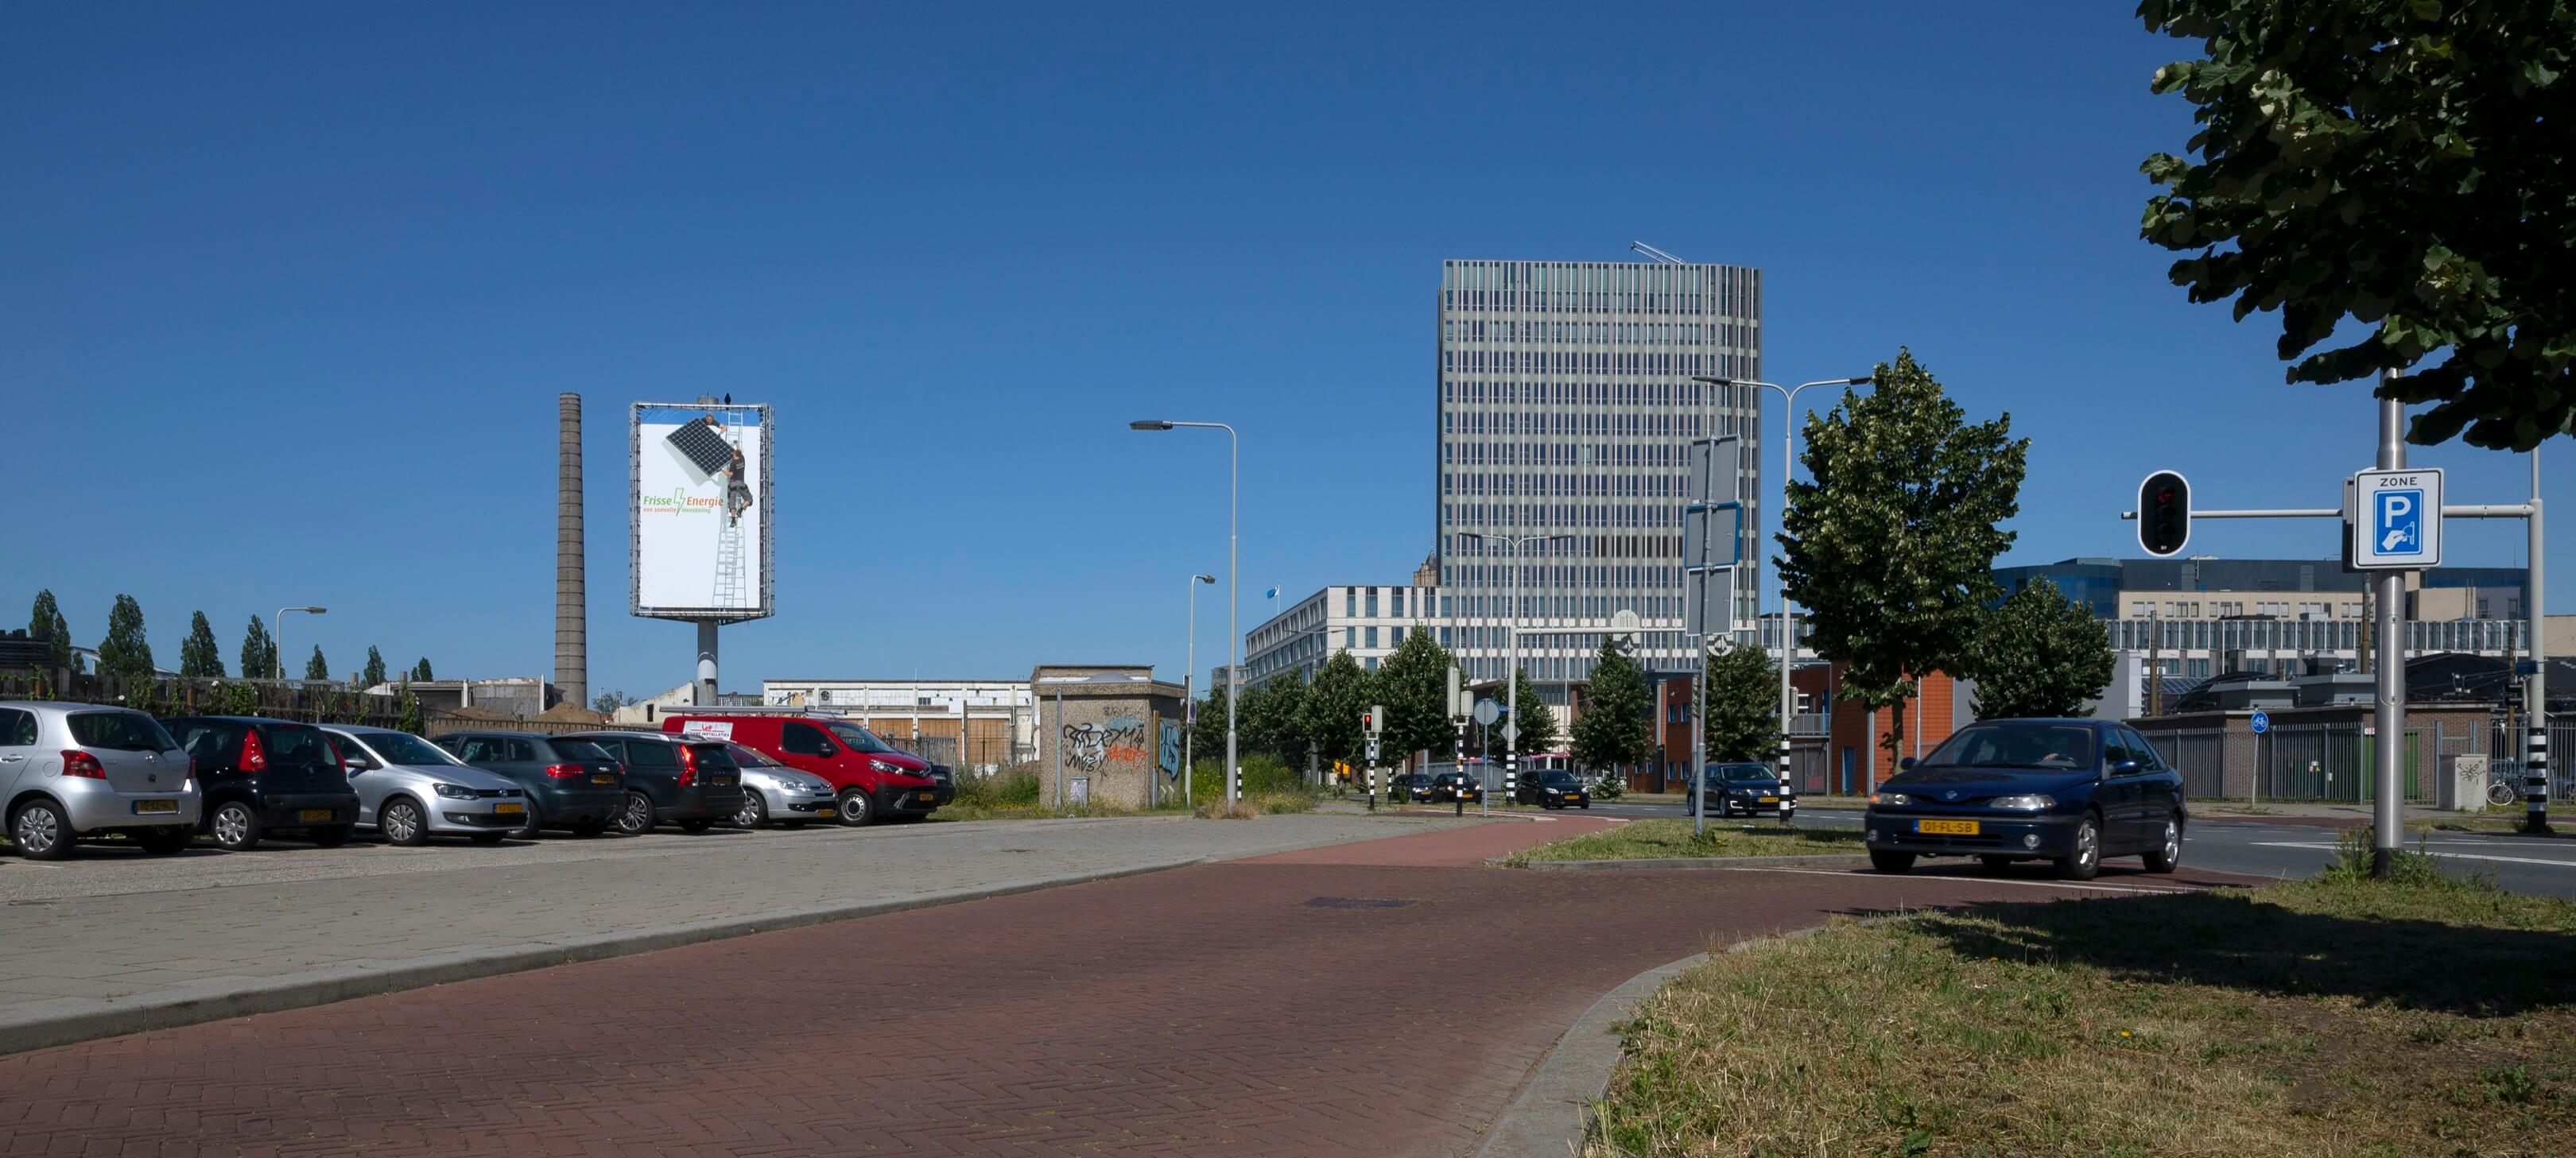 Jurjen Poeles Fotografie billboard Frisse Energie grootformaat print reclame campagne zonnepanelen at work aan het werk in uitvoering